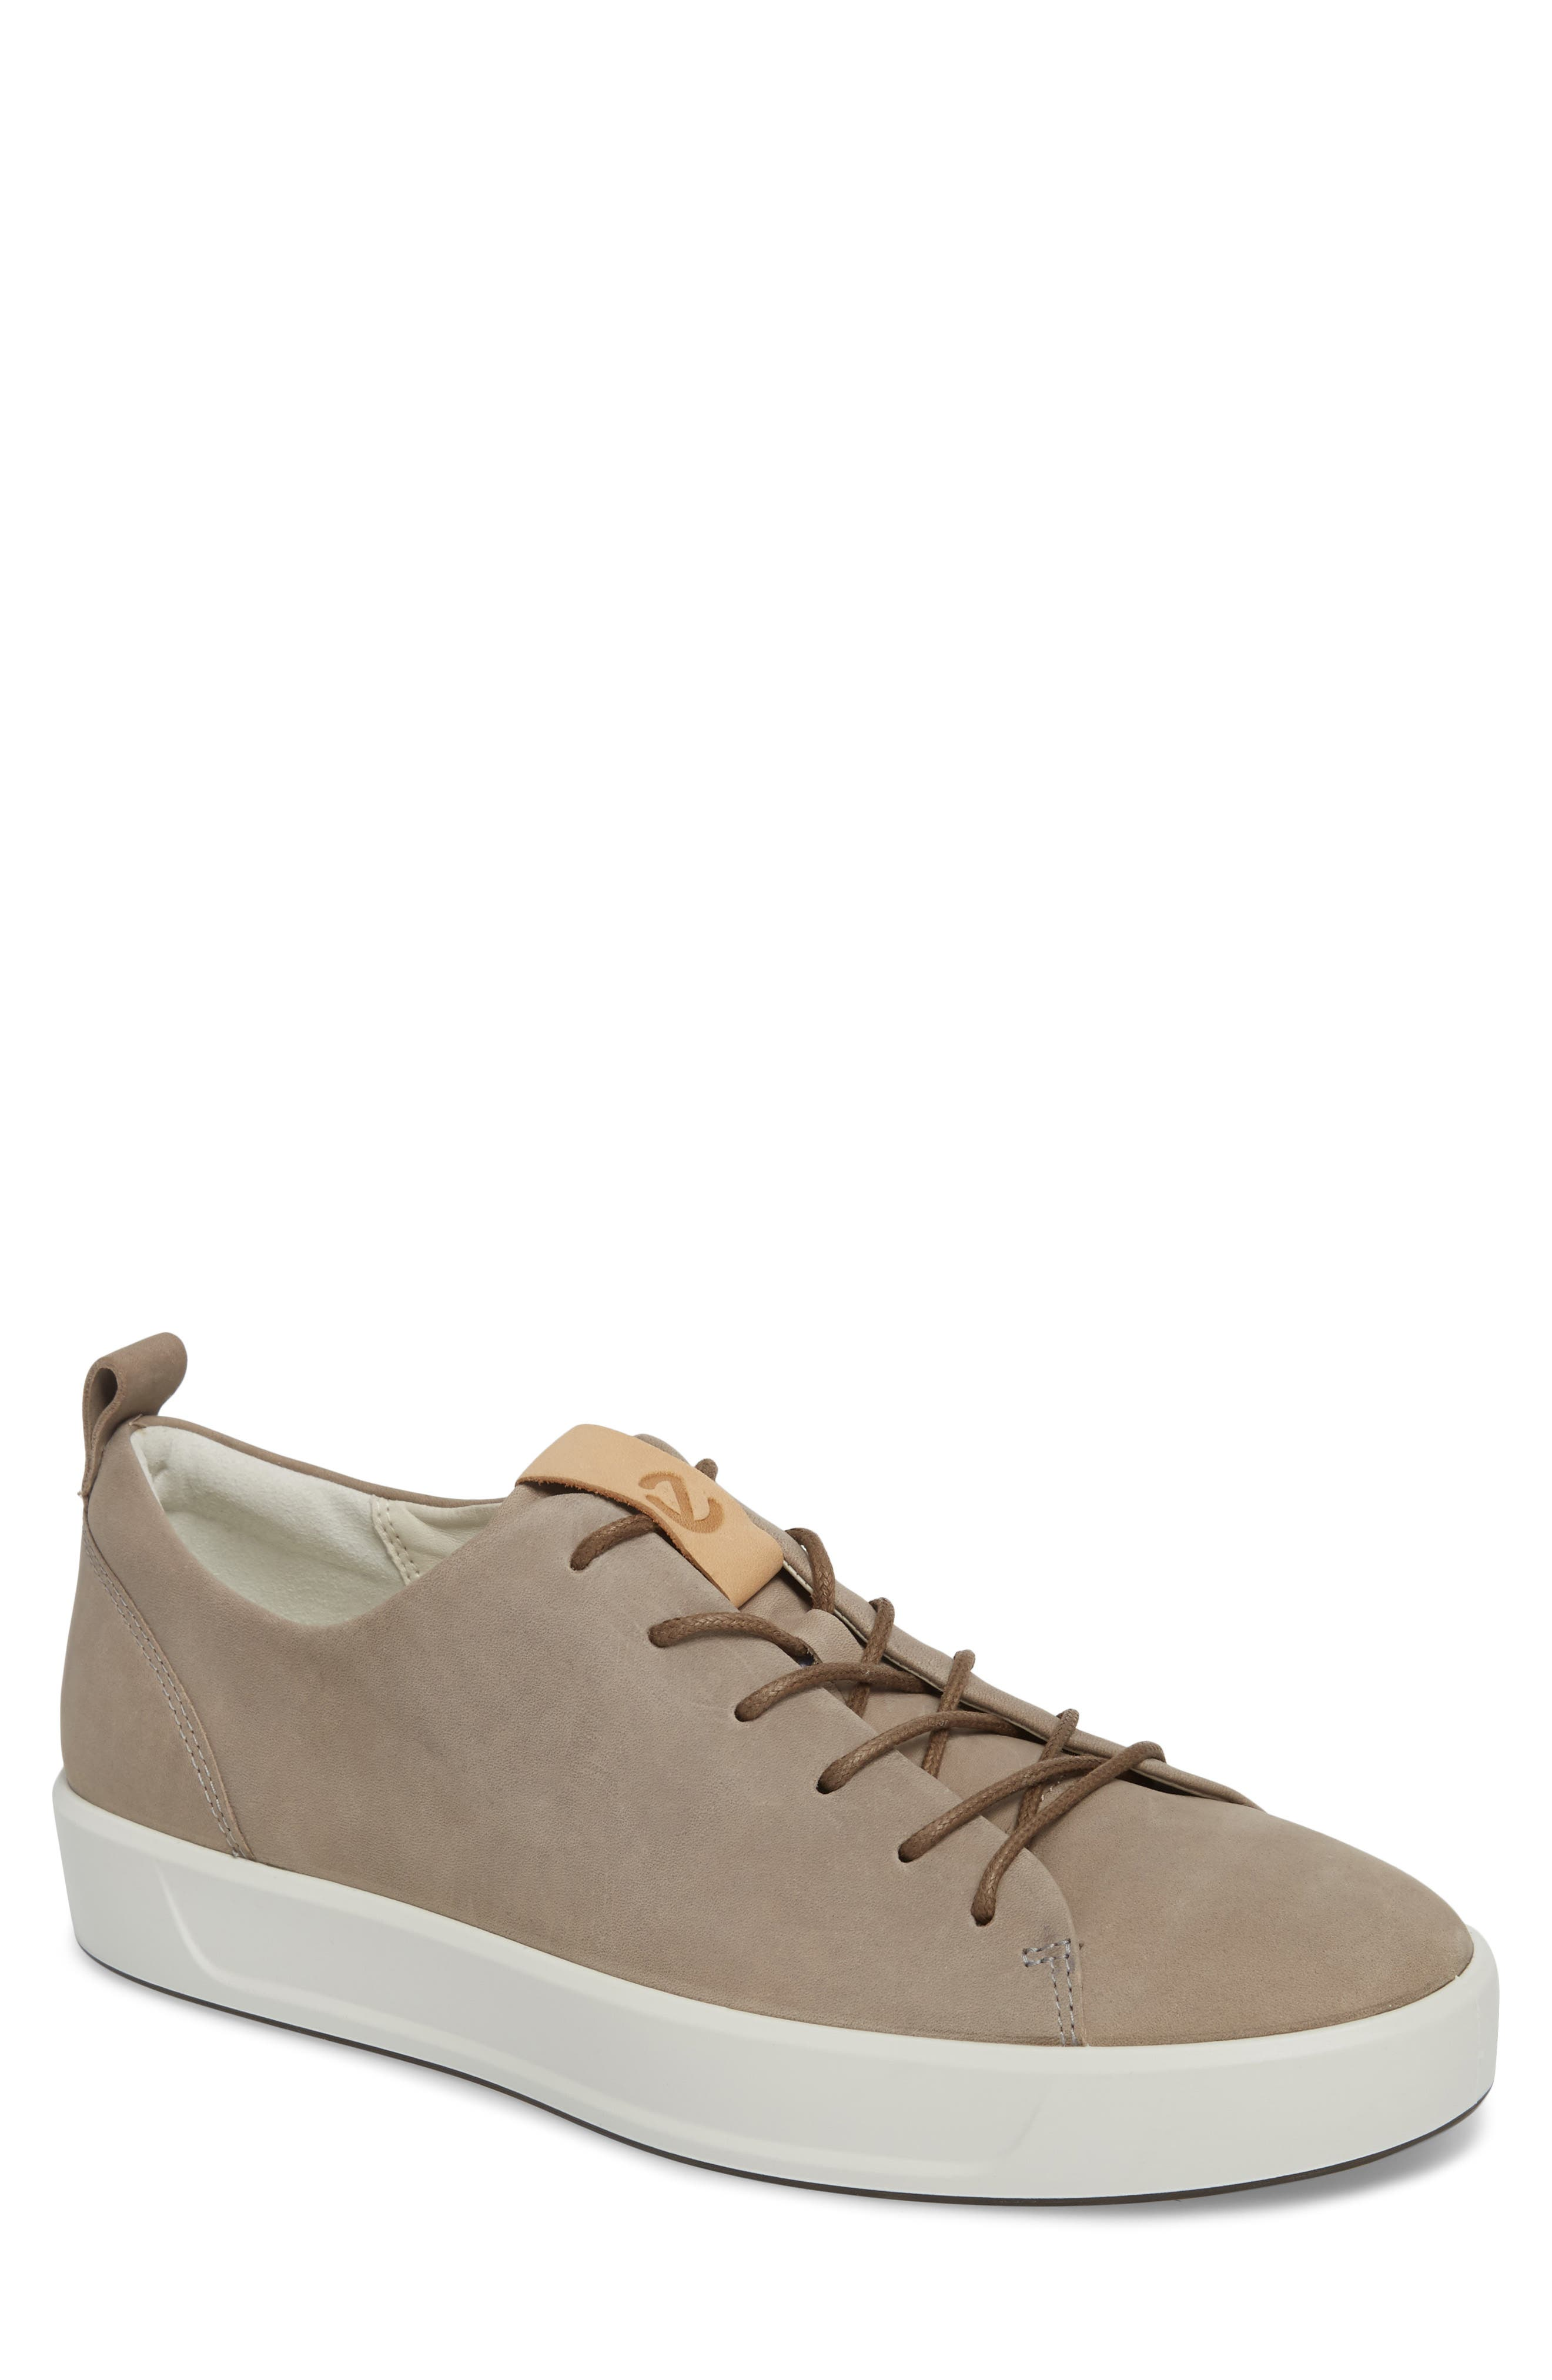 ECCO Soft 8 Sneaker, Main, color, MOONROCK